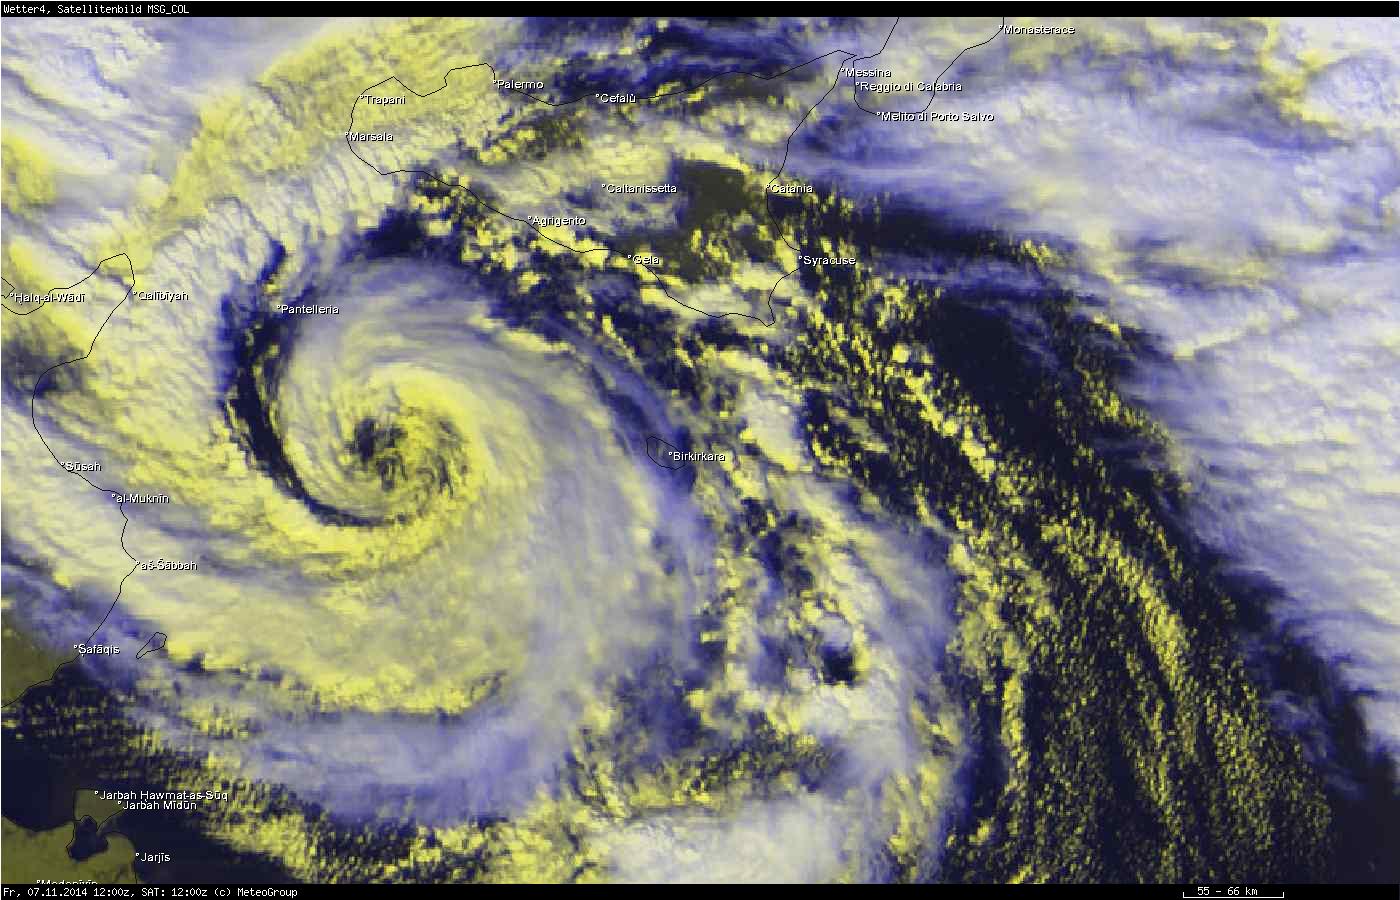 Meteosat-9 RGB, 7 November 12:00 UTC (source: RGB images created by MeteoGroup)